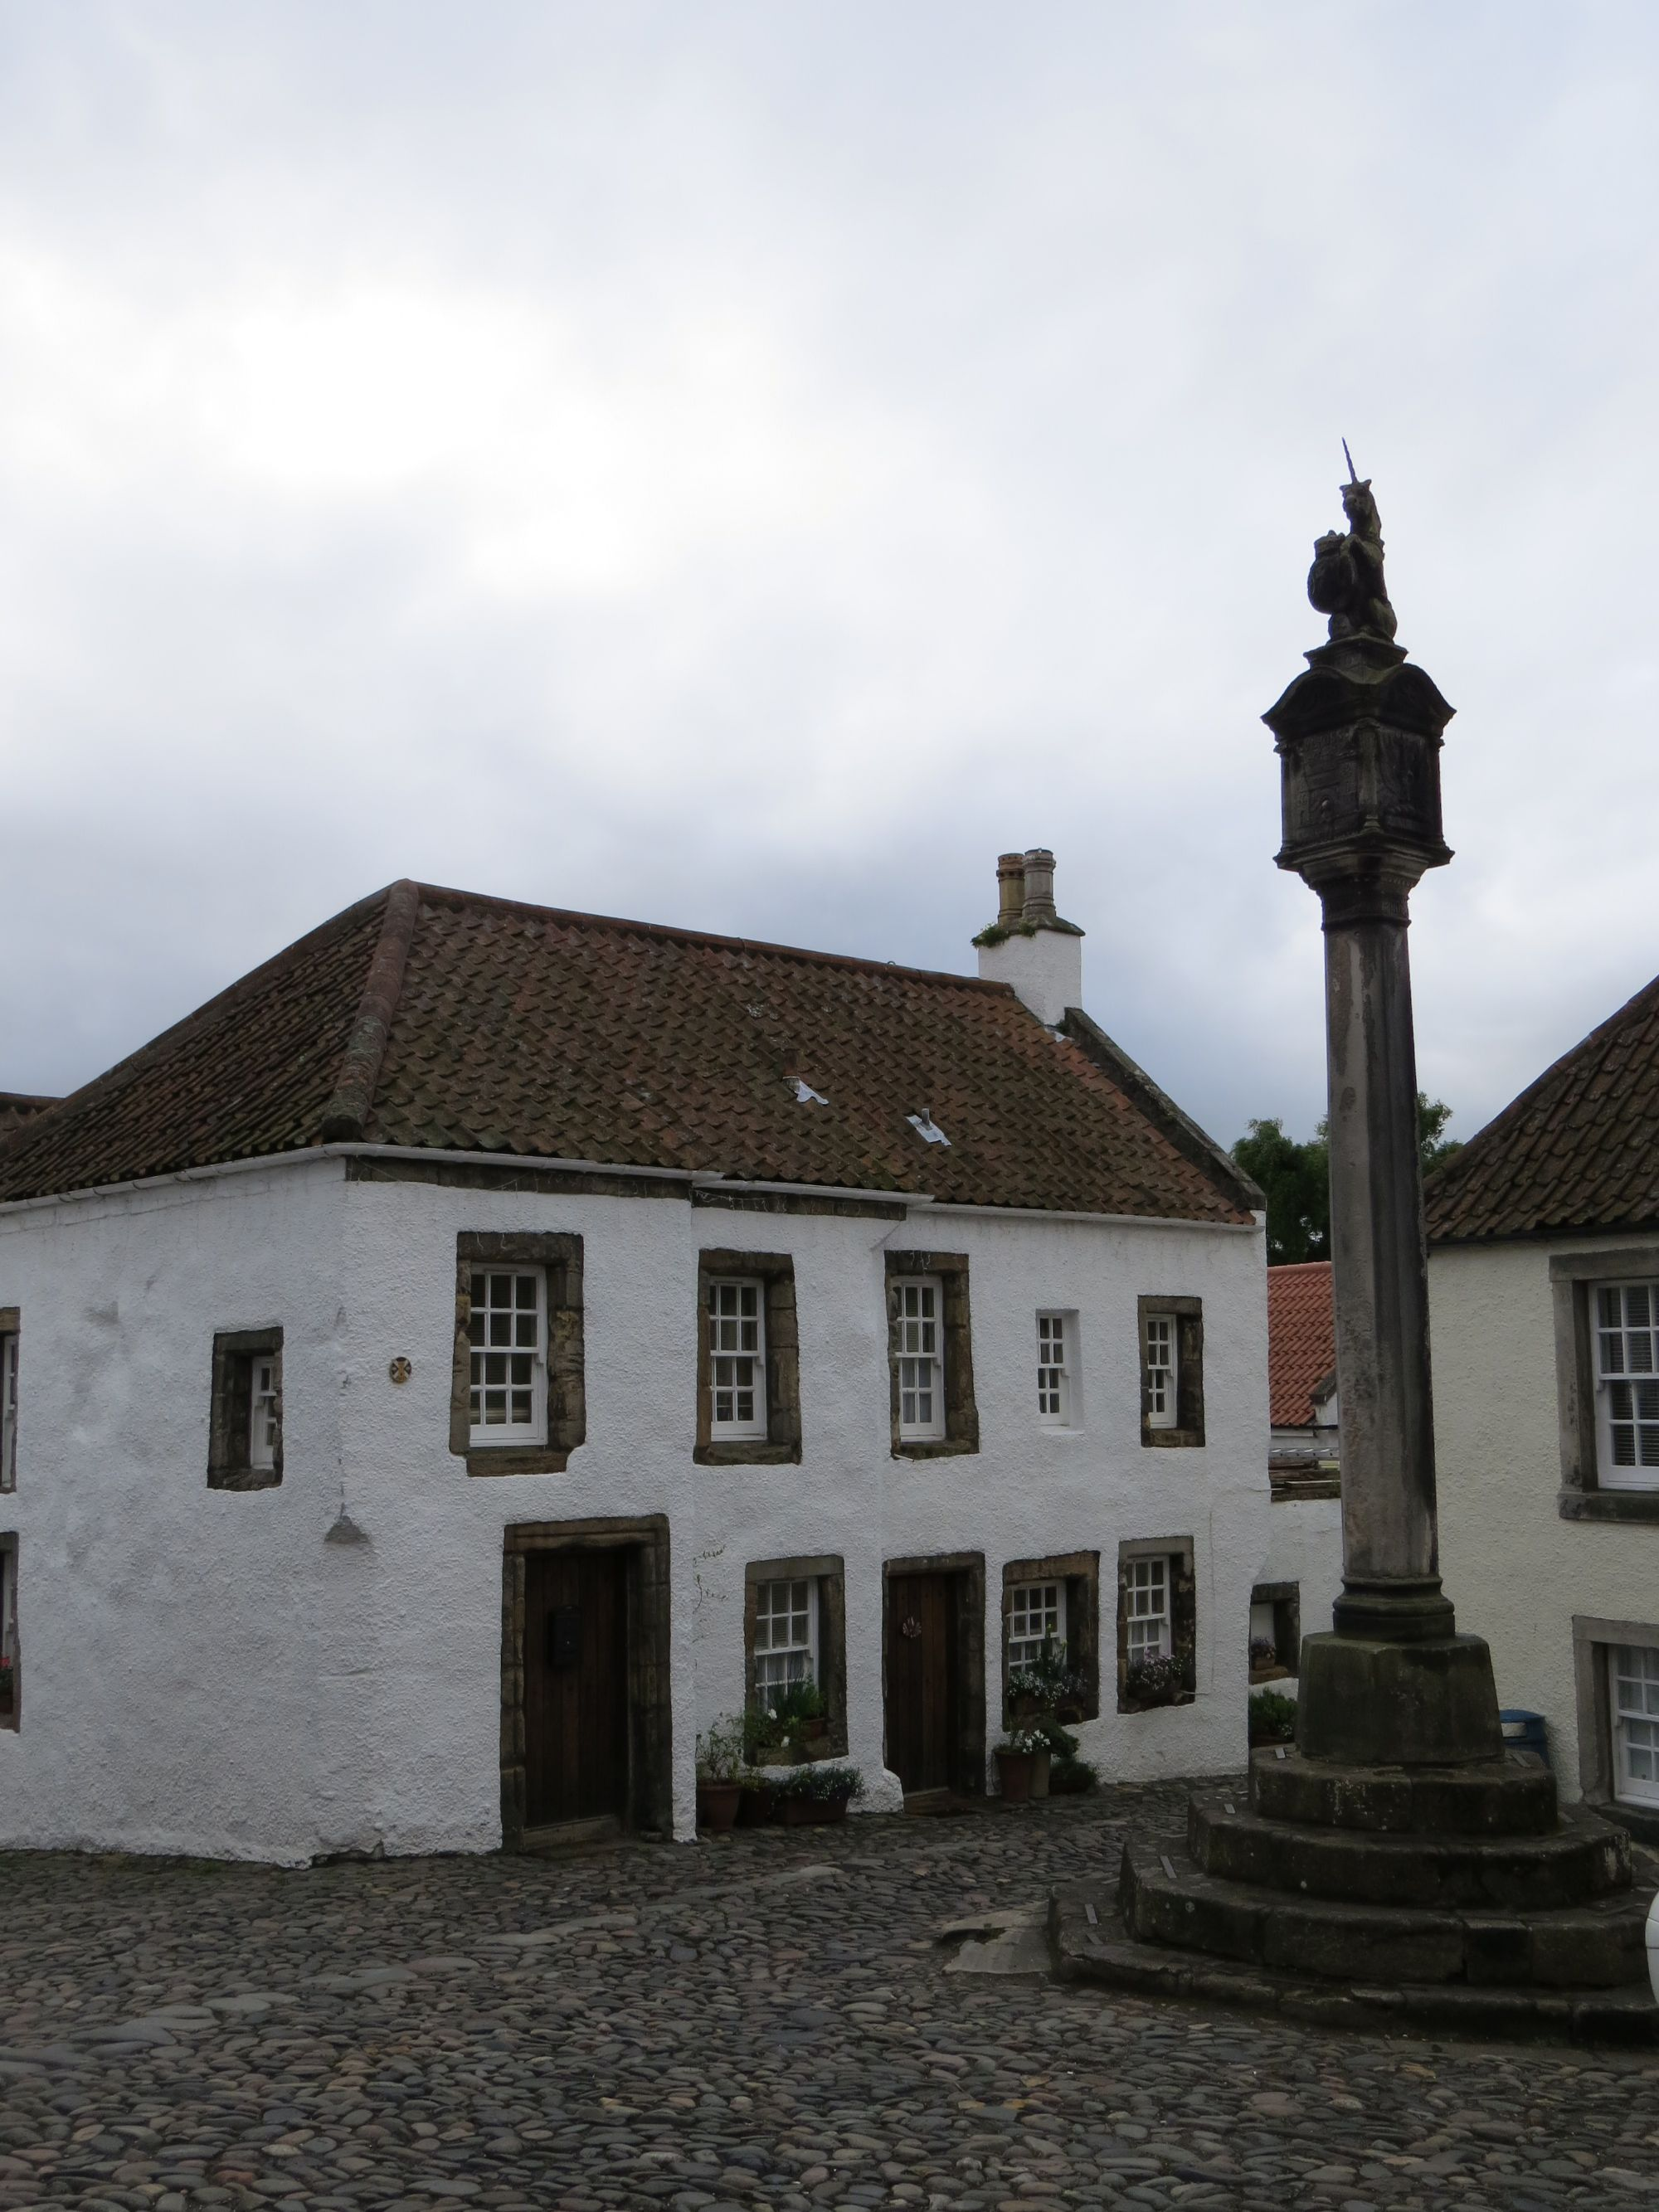 Crainesmuir (Culross)